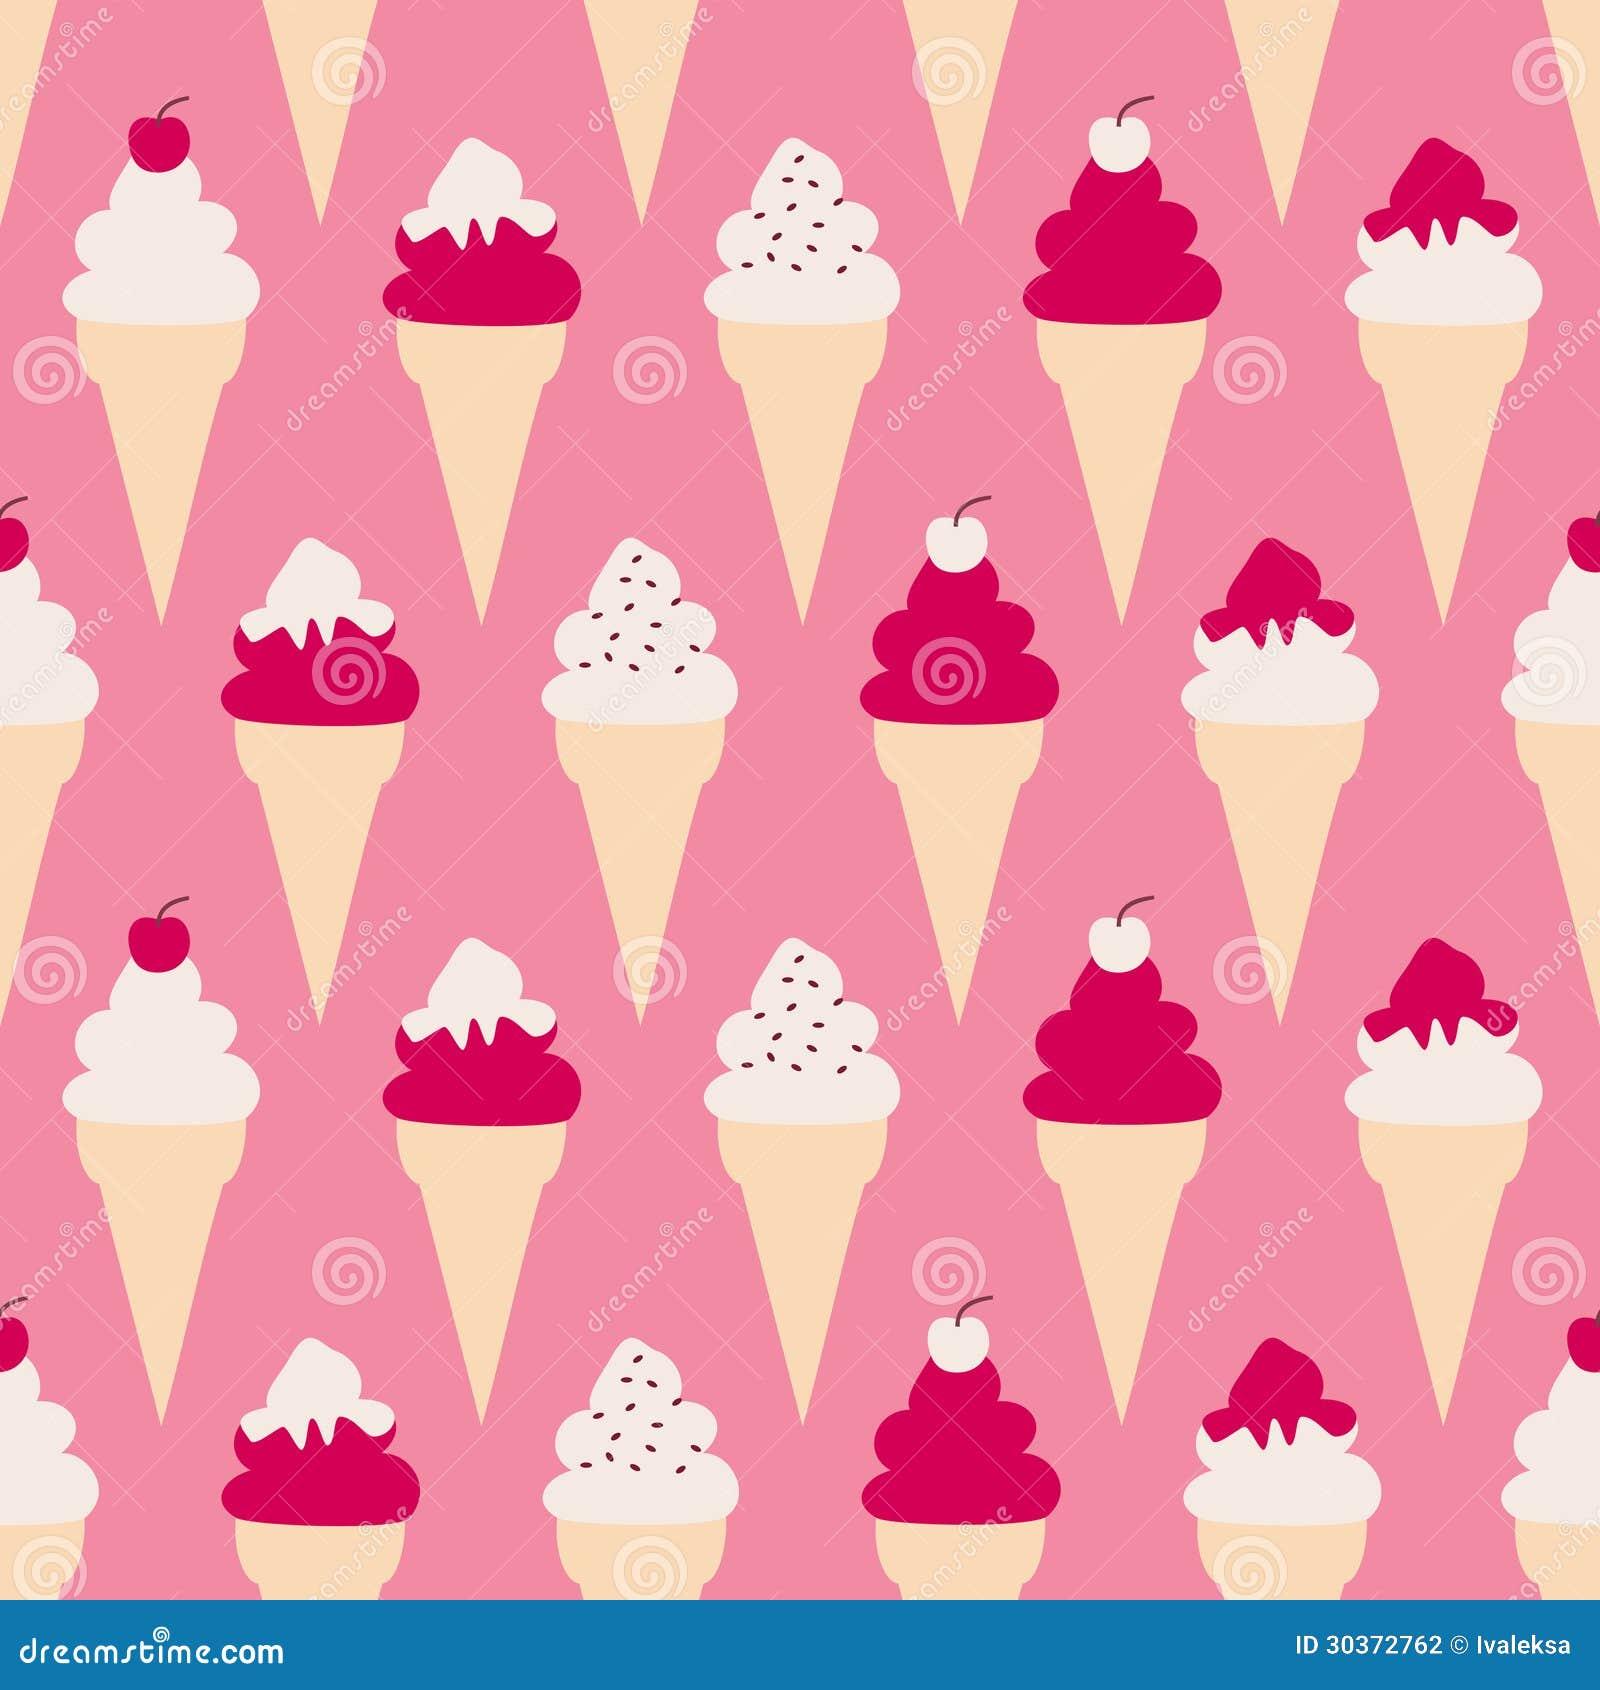 Seamless Ice Cream Background Vintage Style: Ice Cream Cones Background Stock Photography